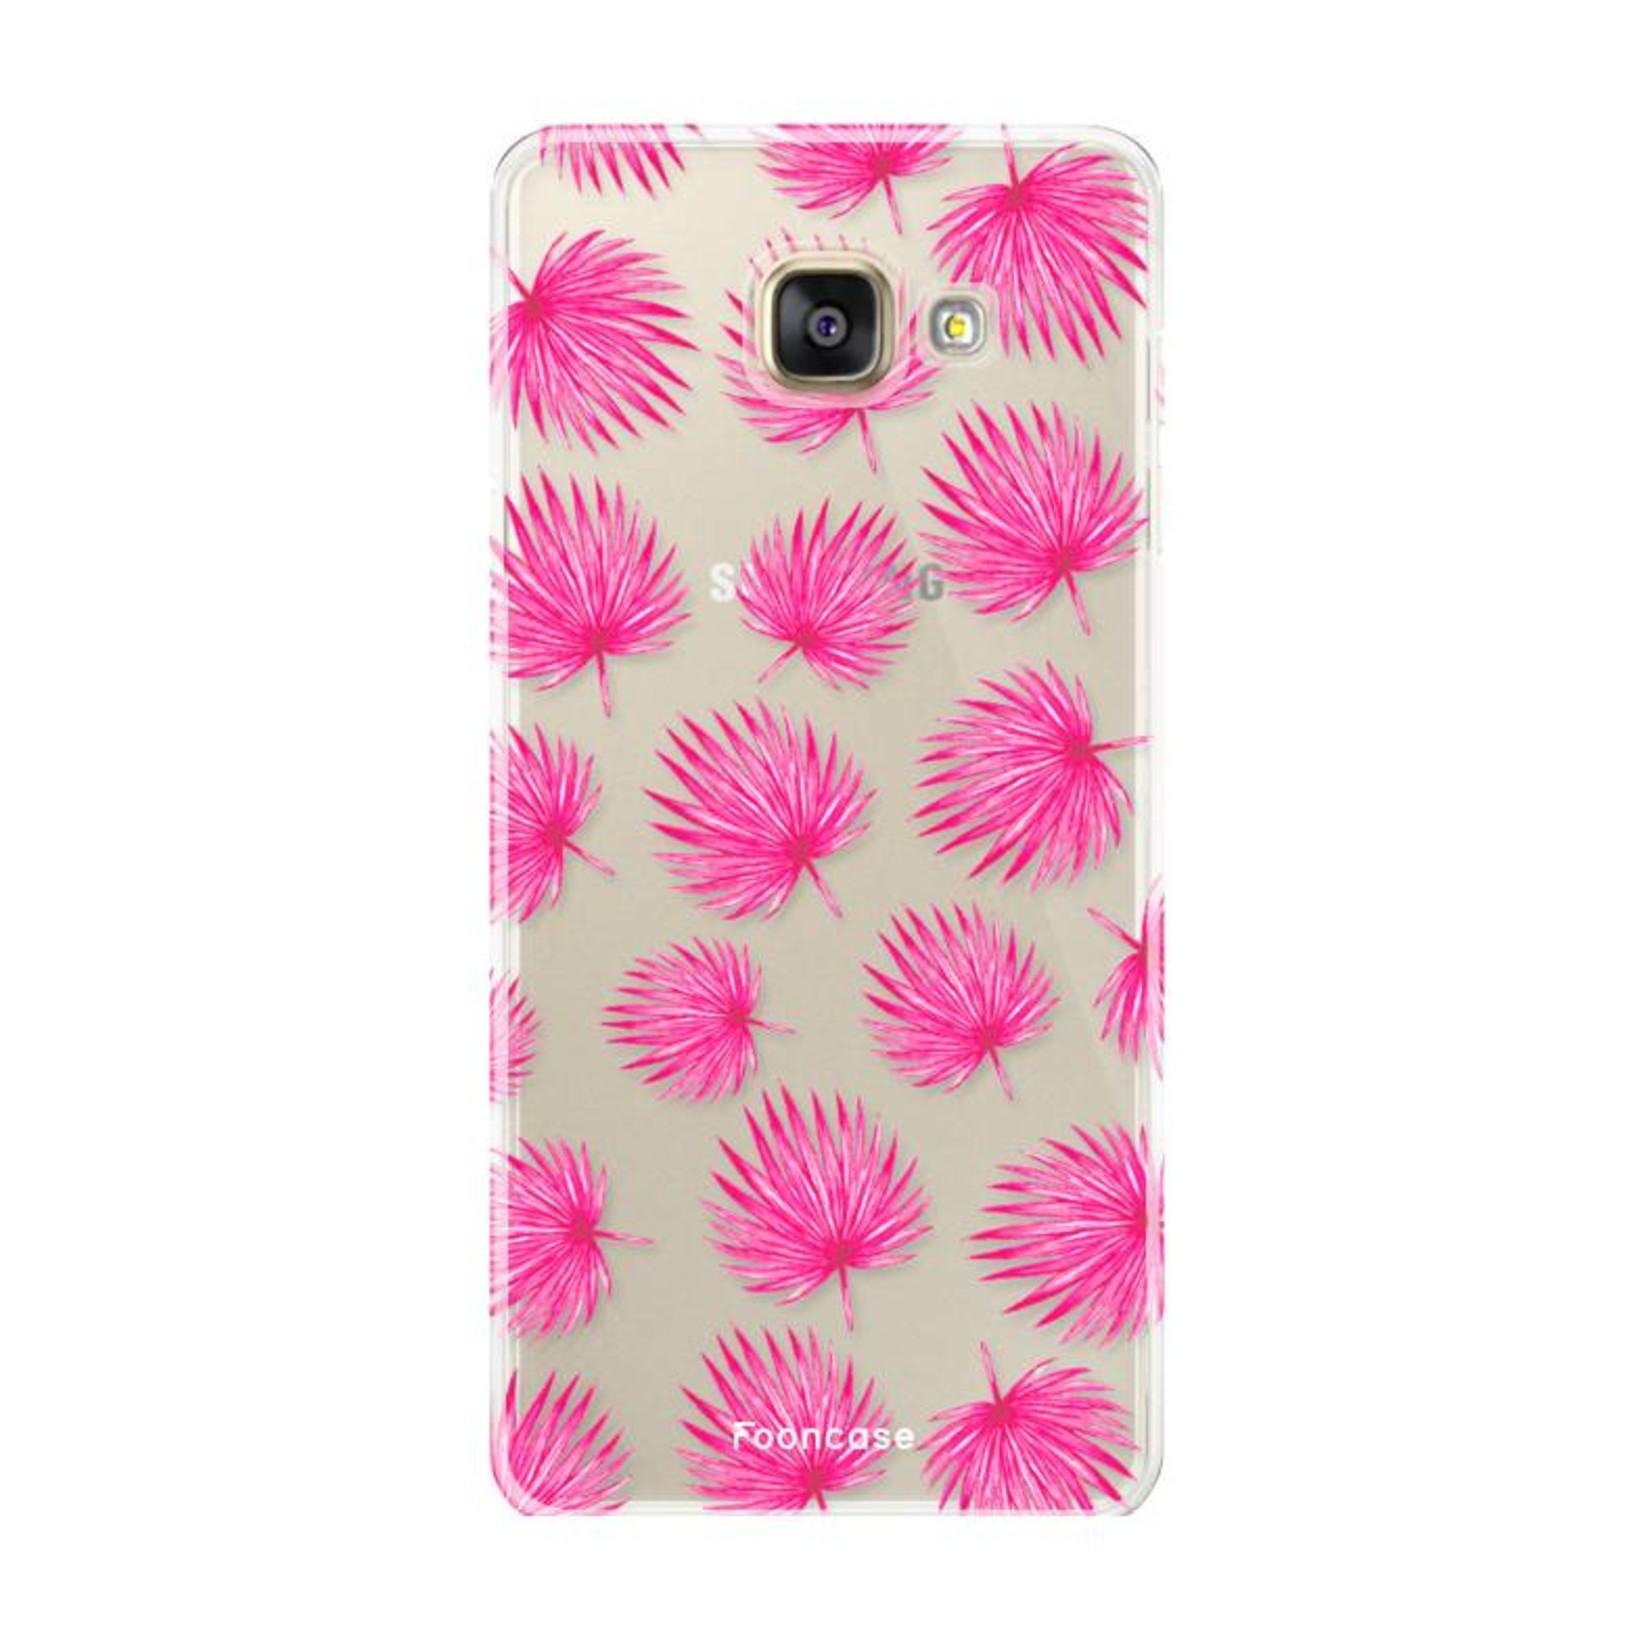 FOONCASE Samsung Galaxy A3 2016 Handyhülle - Rosa Blätter